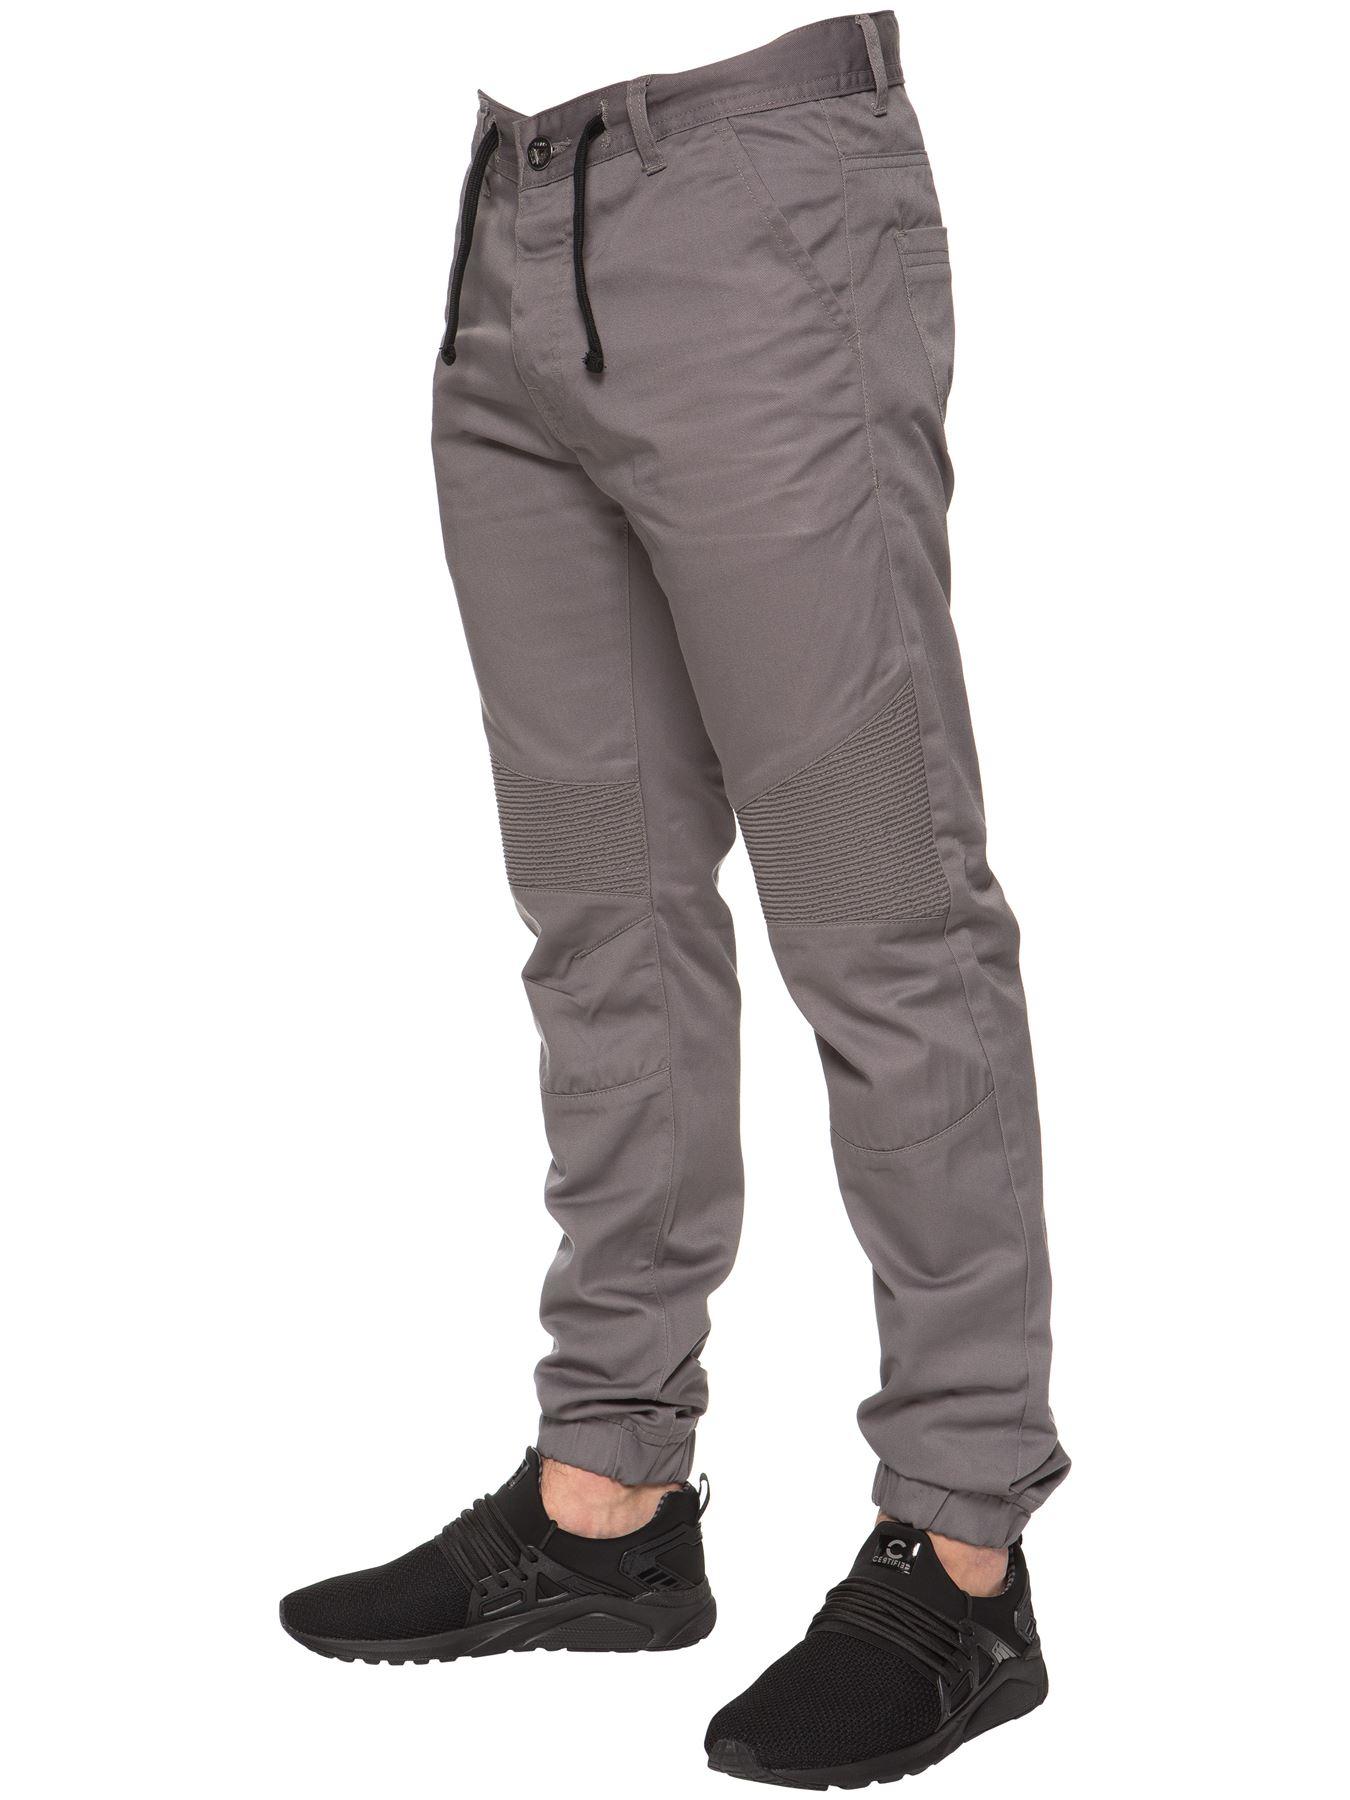 Enzo-Designer-Mens-Cuffed-Chinos-Biker-Jeans-Slim-Denim-Trousers-Pants-Joggers thumbnail 11